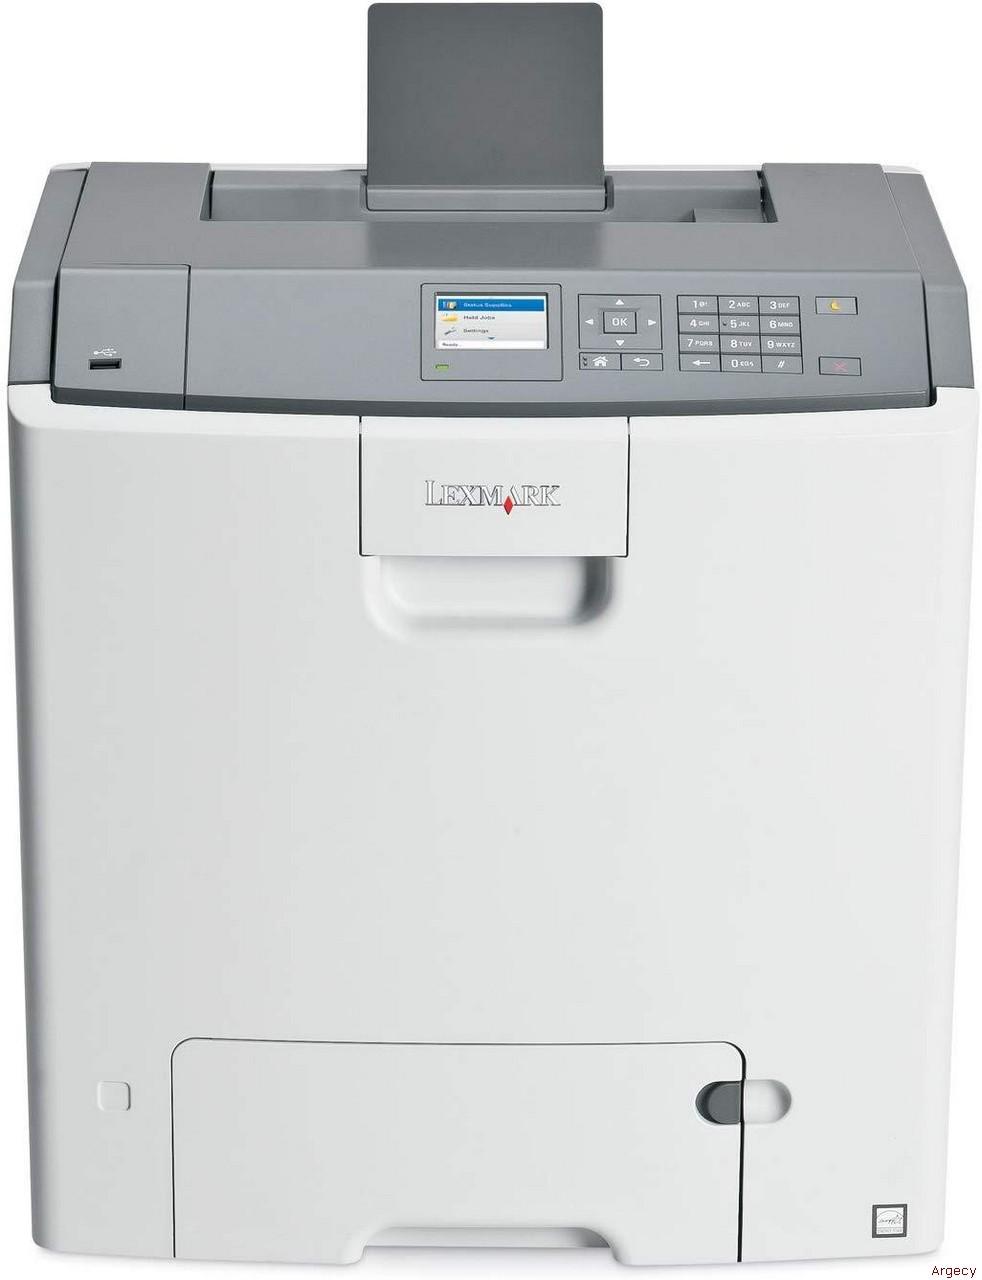 Lexmark C748 Series Printer